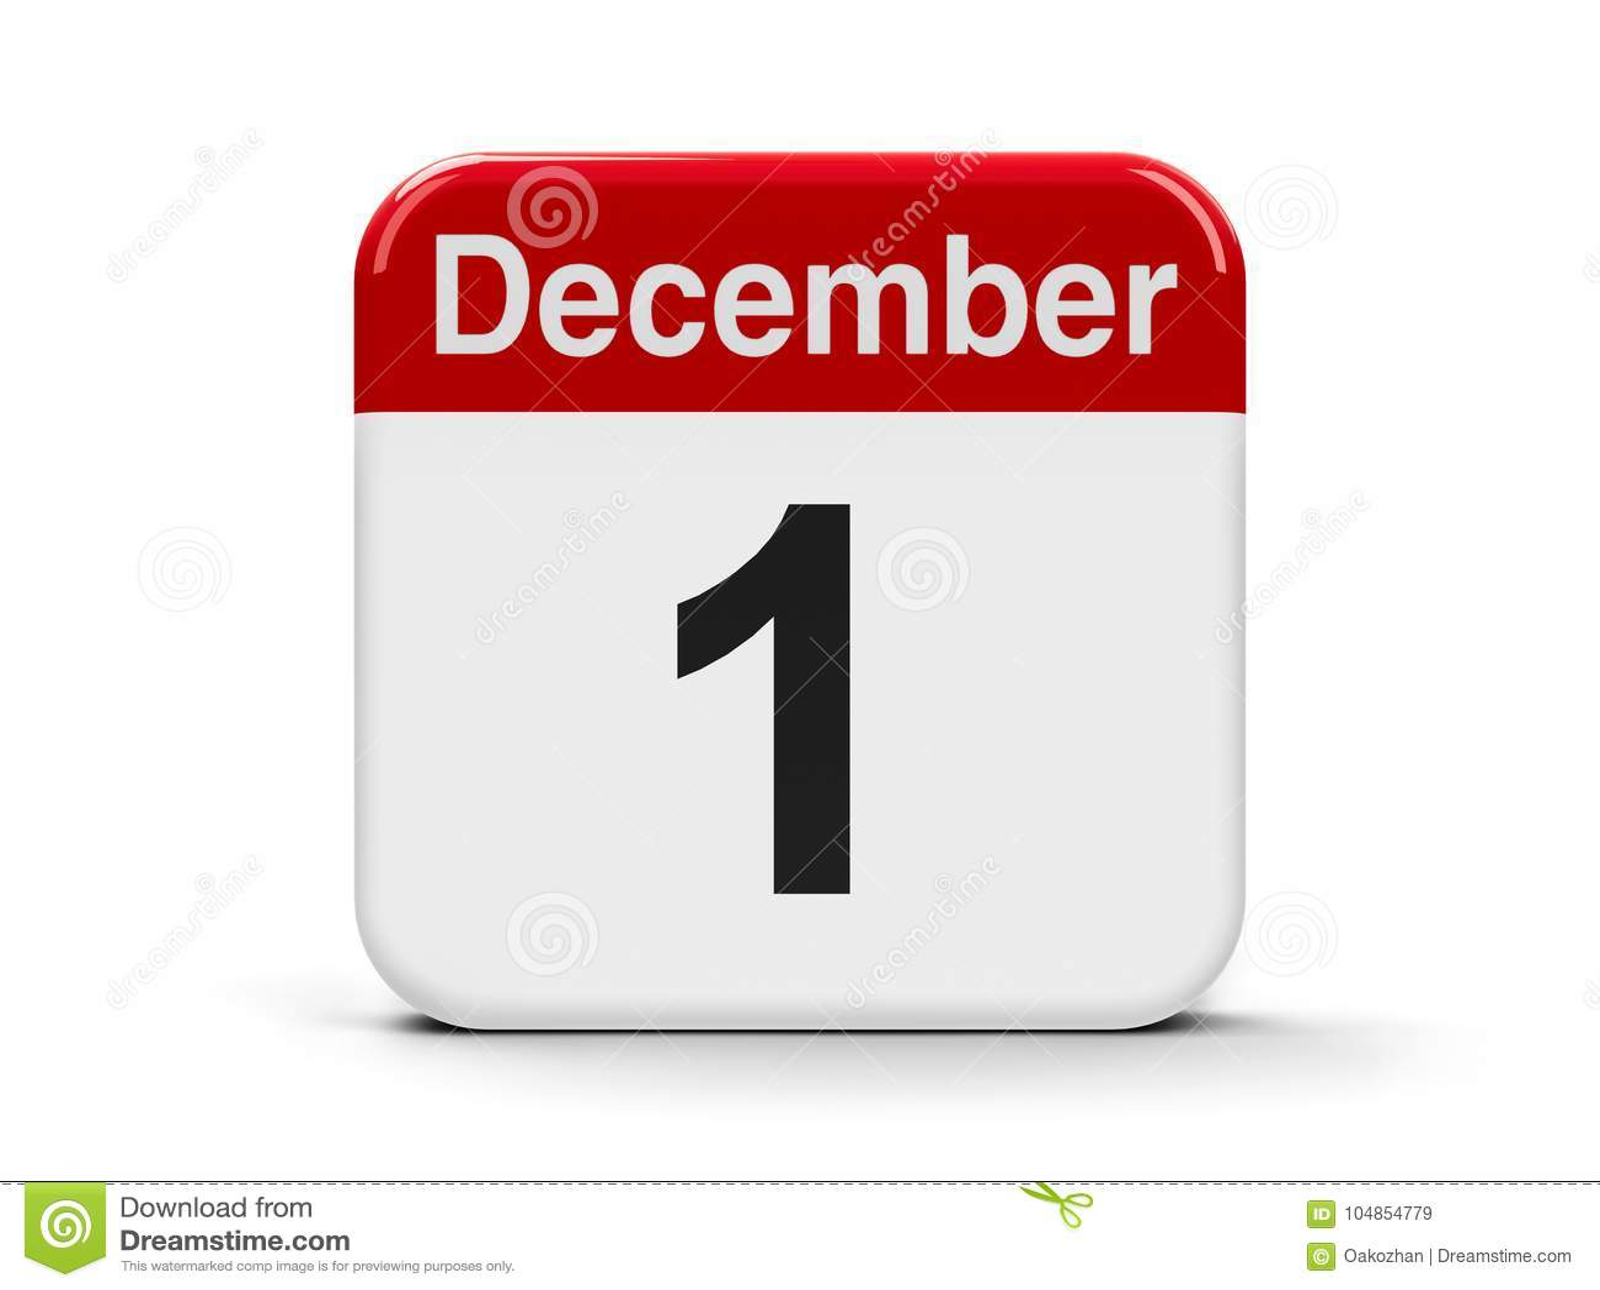 1st December